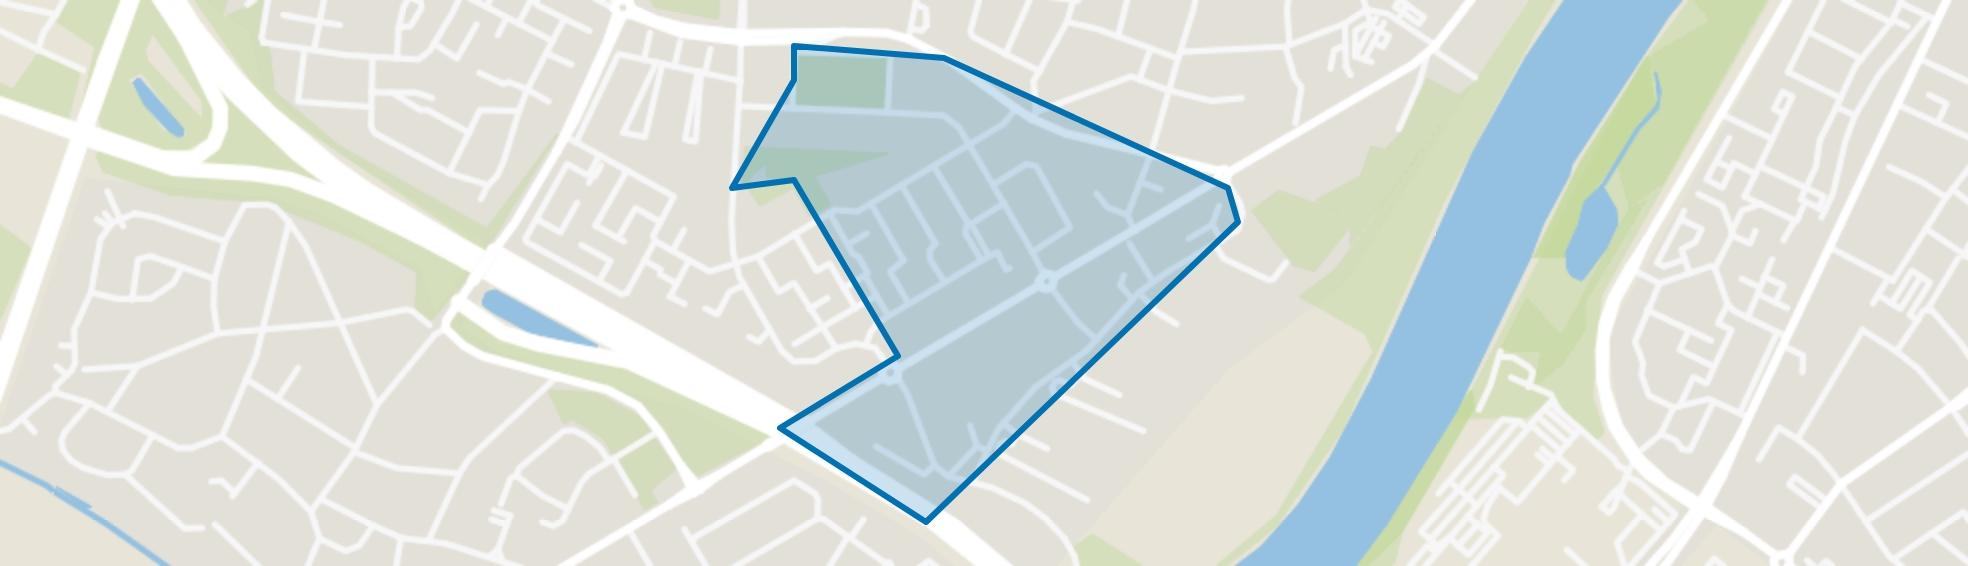 Annakamp-Oost, Venlo map